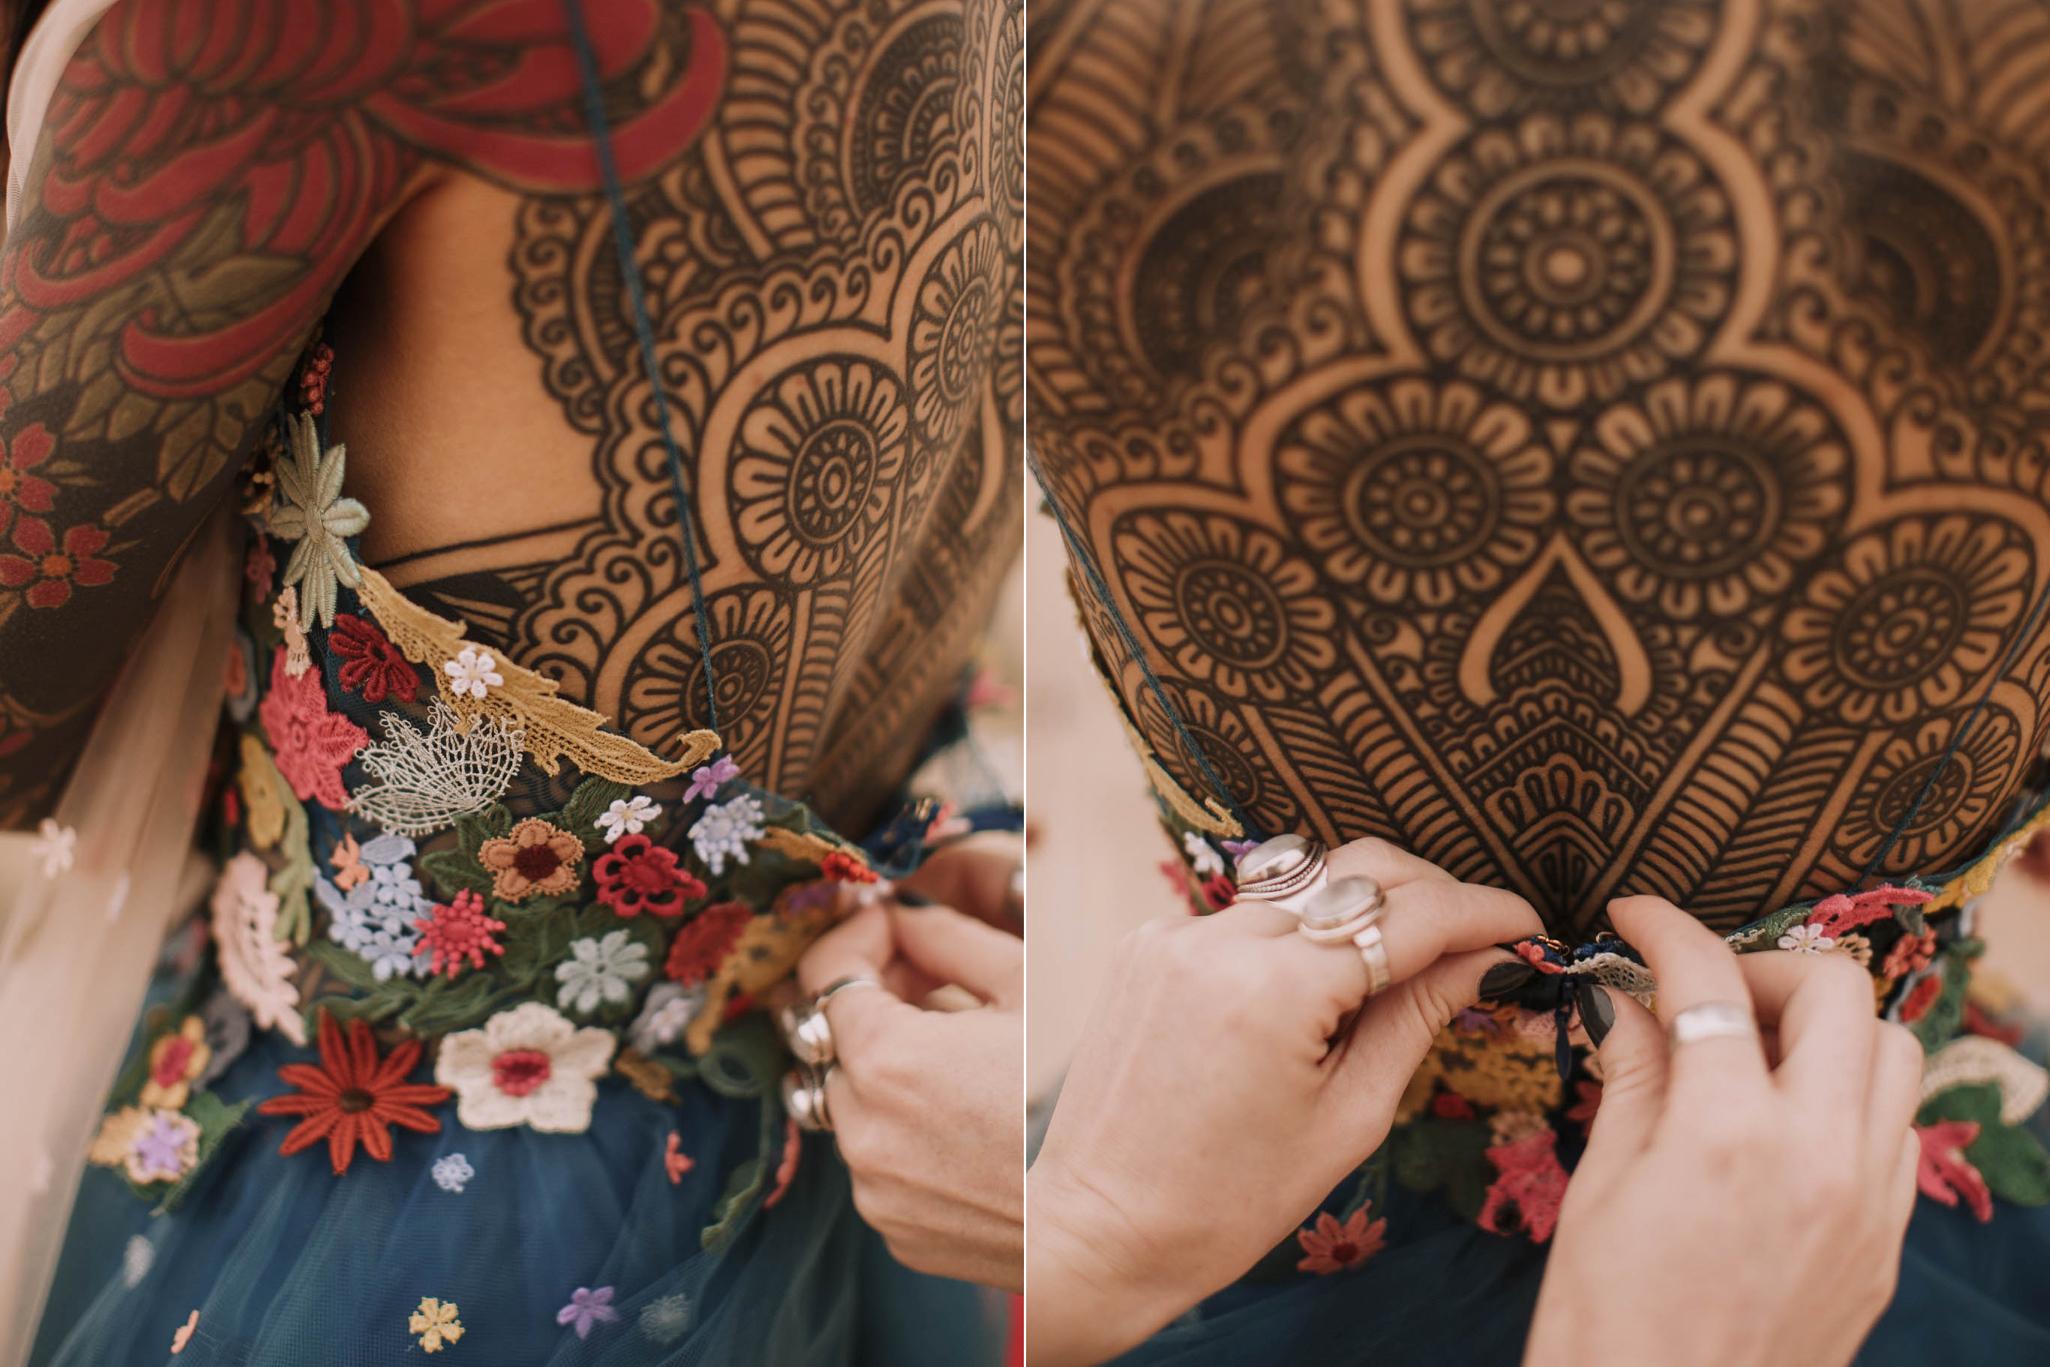 Spain-wedding-photographer-bardenas-reales-jeremy-boyer-photographe-mariage-bordeaux-floral-wedding-dress-robe-63.jpg